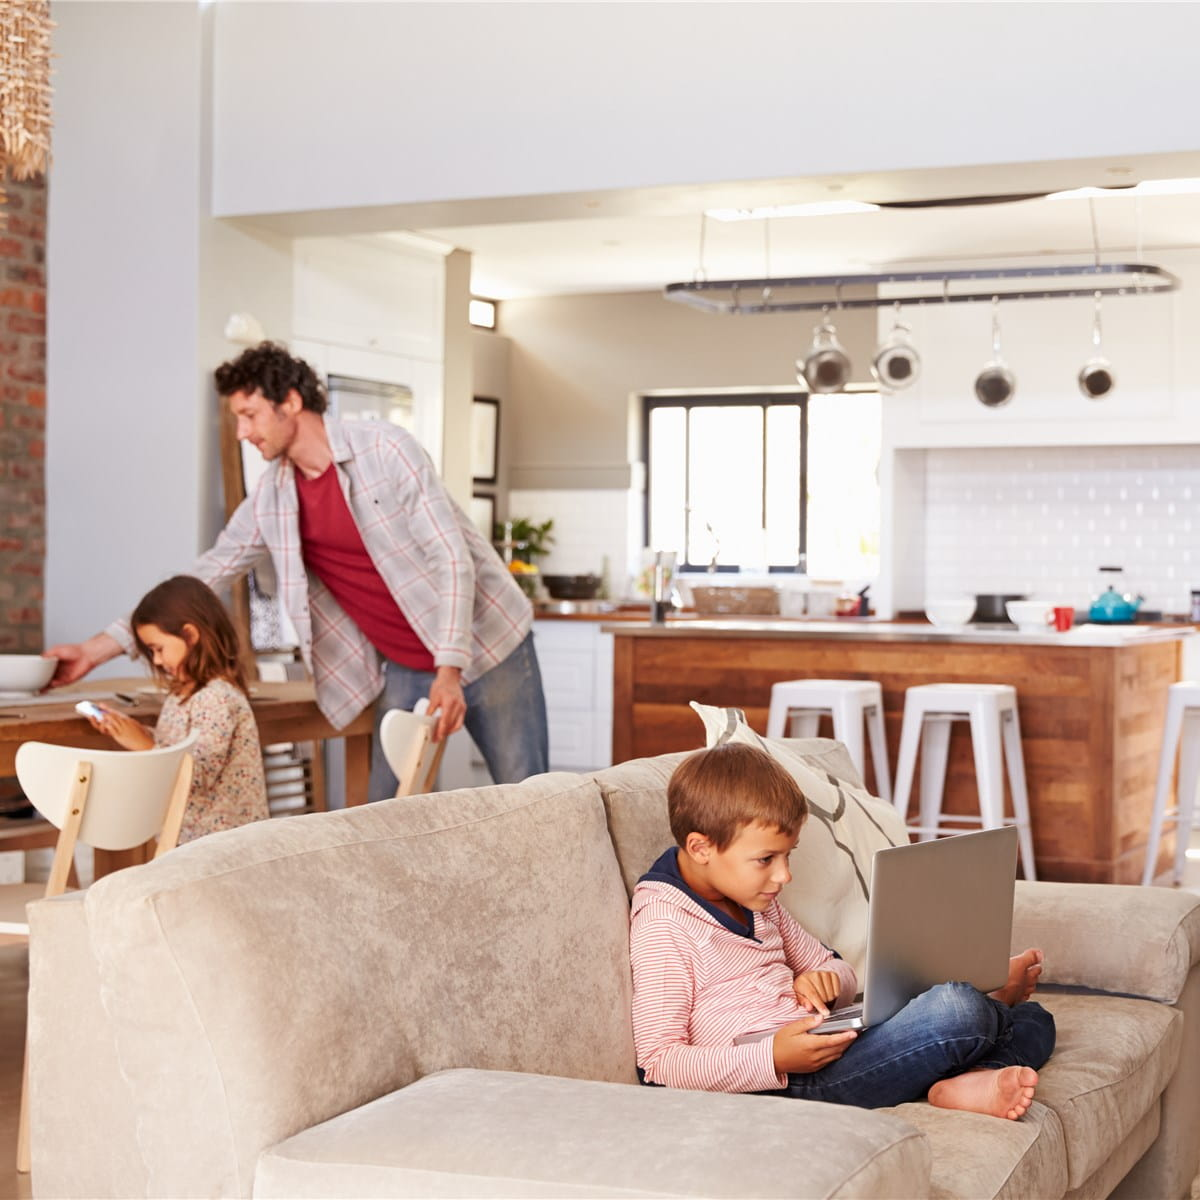 ergo versicherung wilfried lange in lennestadt. Black Bedroom Furniture Sets. Home Design Ideas